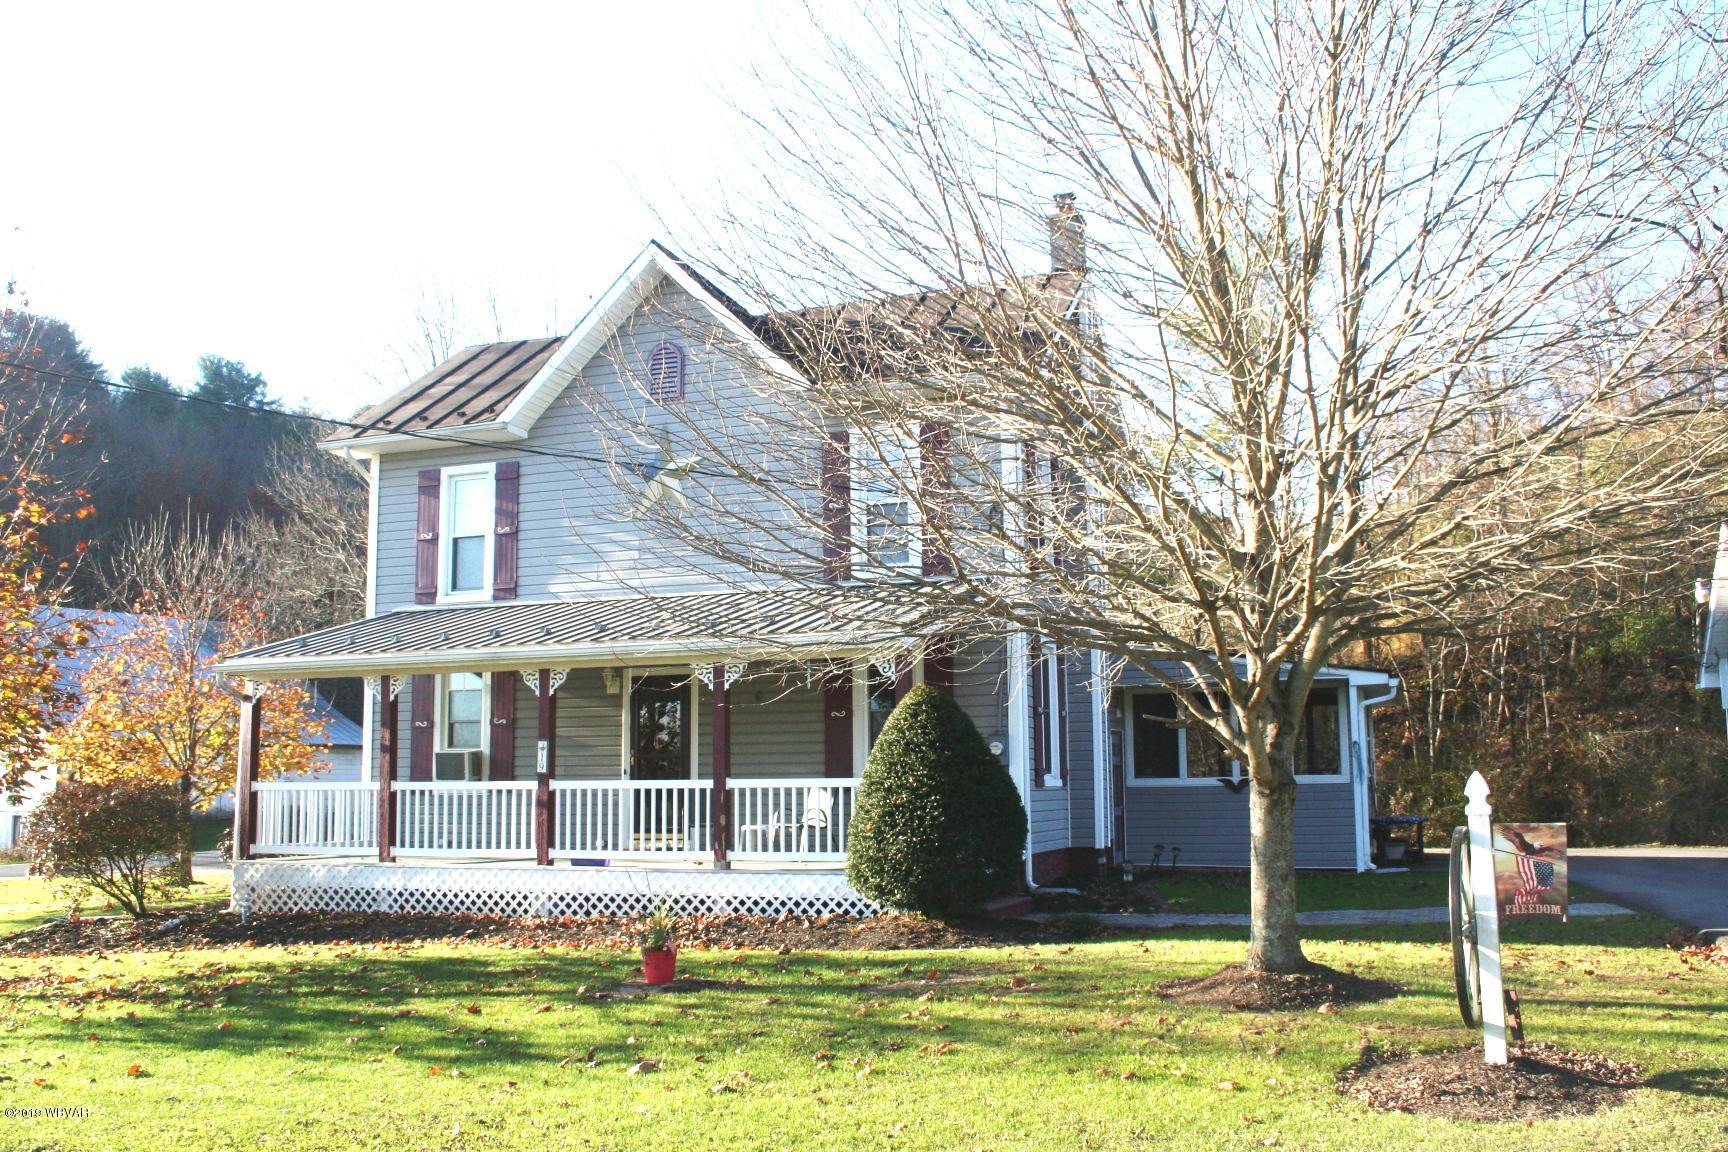 19 WISTAR ROAD,Hughesville,PA 17737,4 Bedrooms Bedrooms,1.75 BathroomsBathrooms,Residential,WISTAR,WB-89037